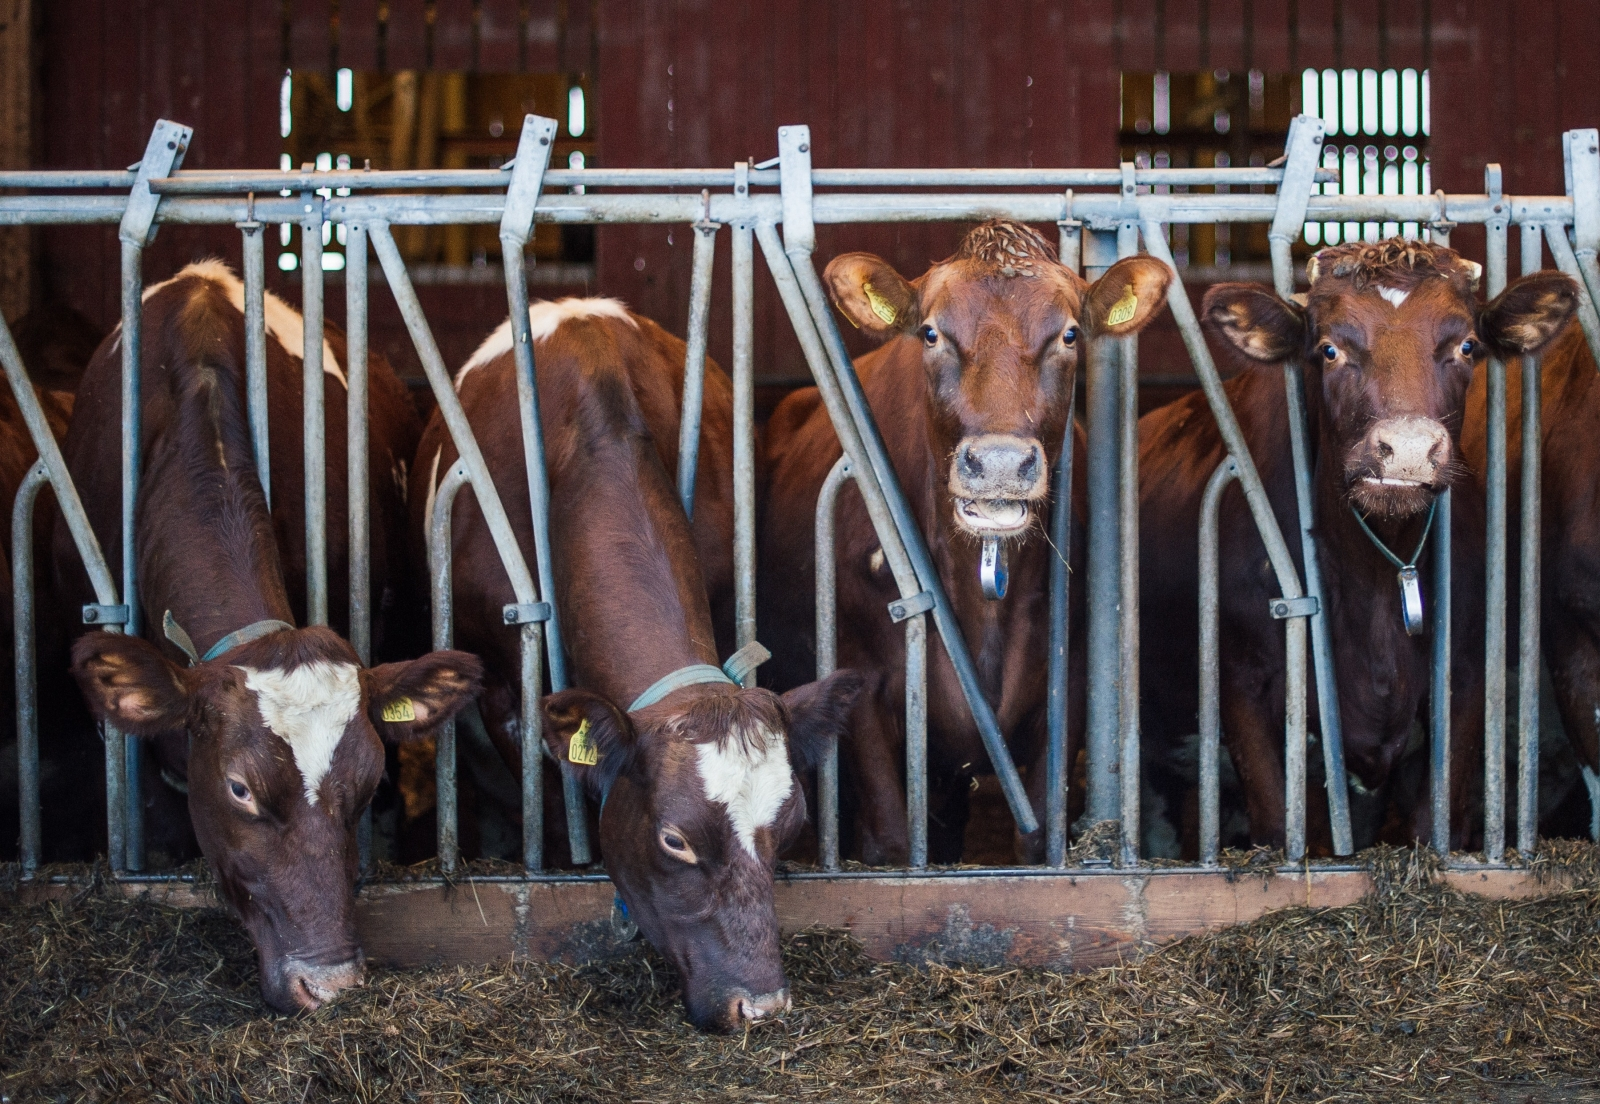 Cows feed at Swedish dairy farm